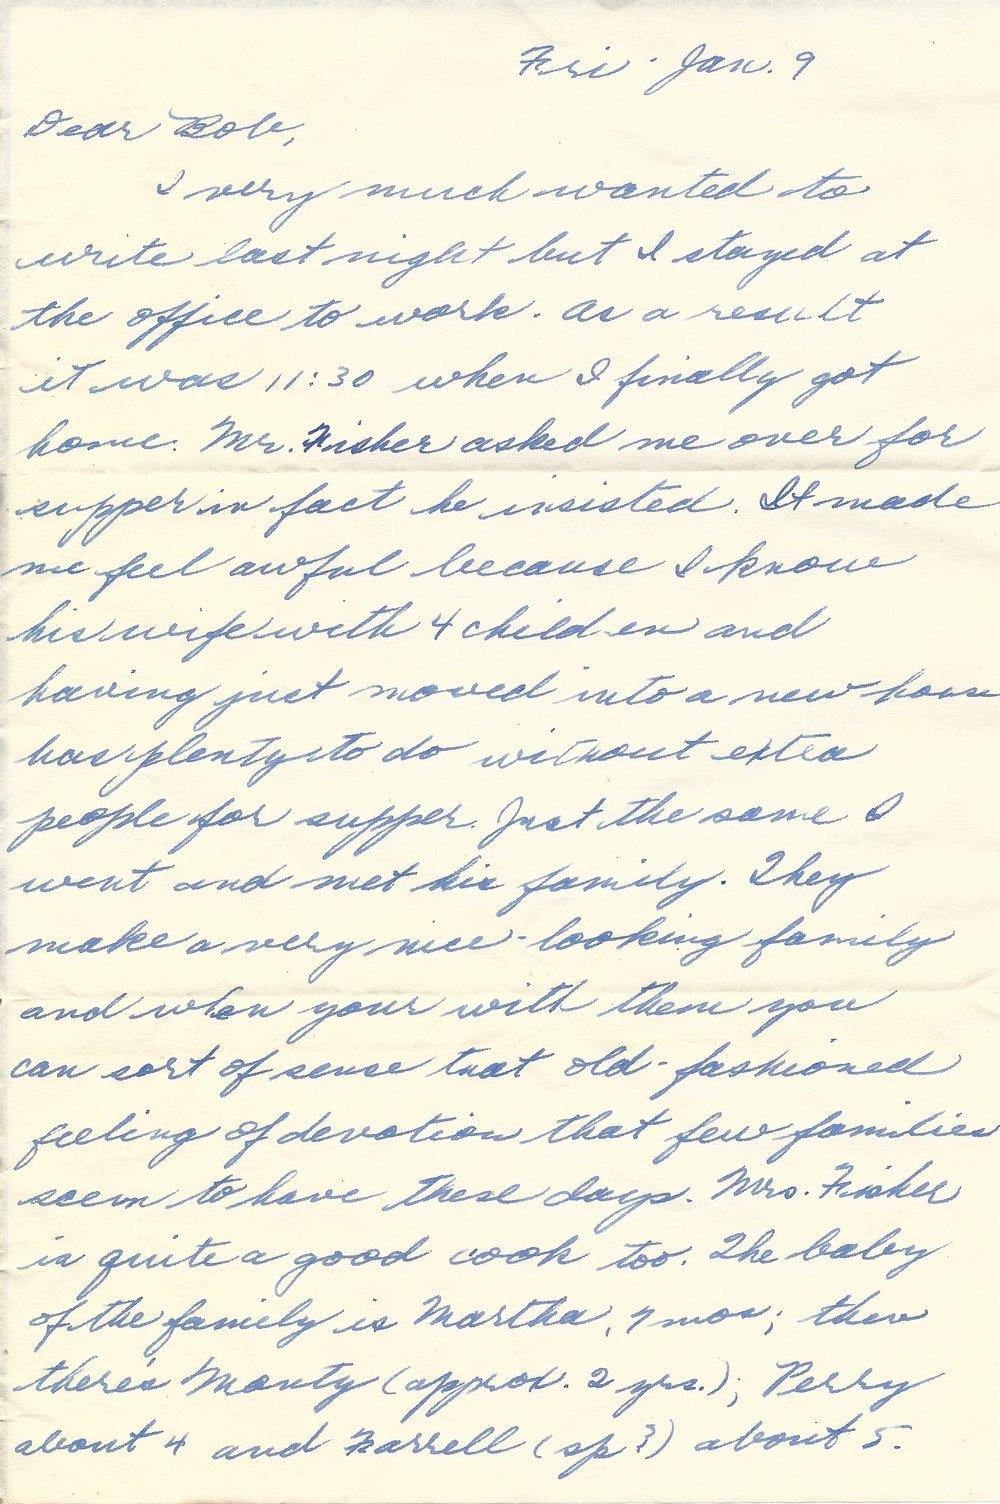 4. Jan. 9, 1953 (Oma)_Page_2.jpg